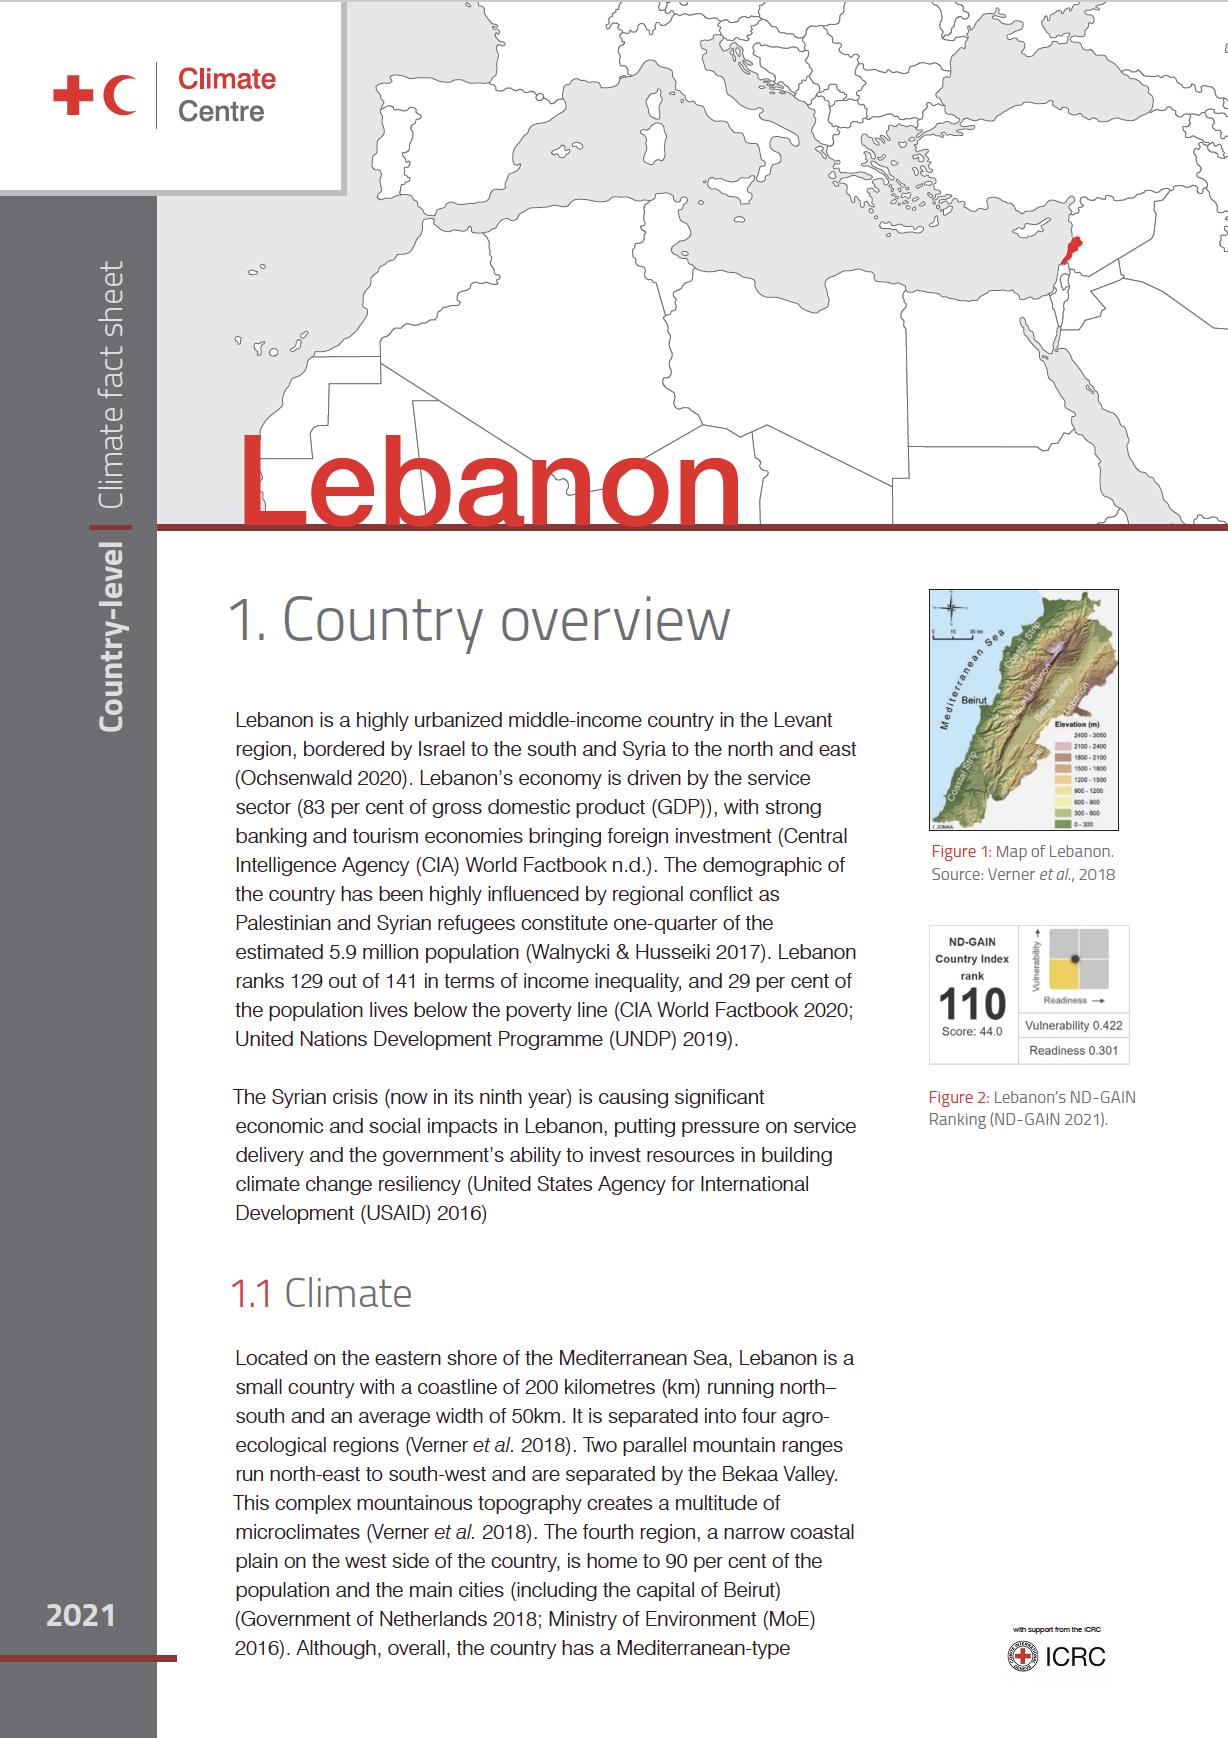 Country Factsheet: Lebanon